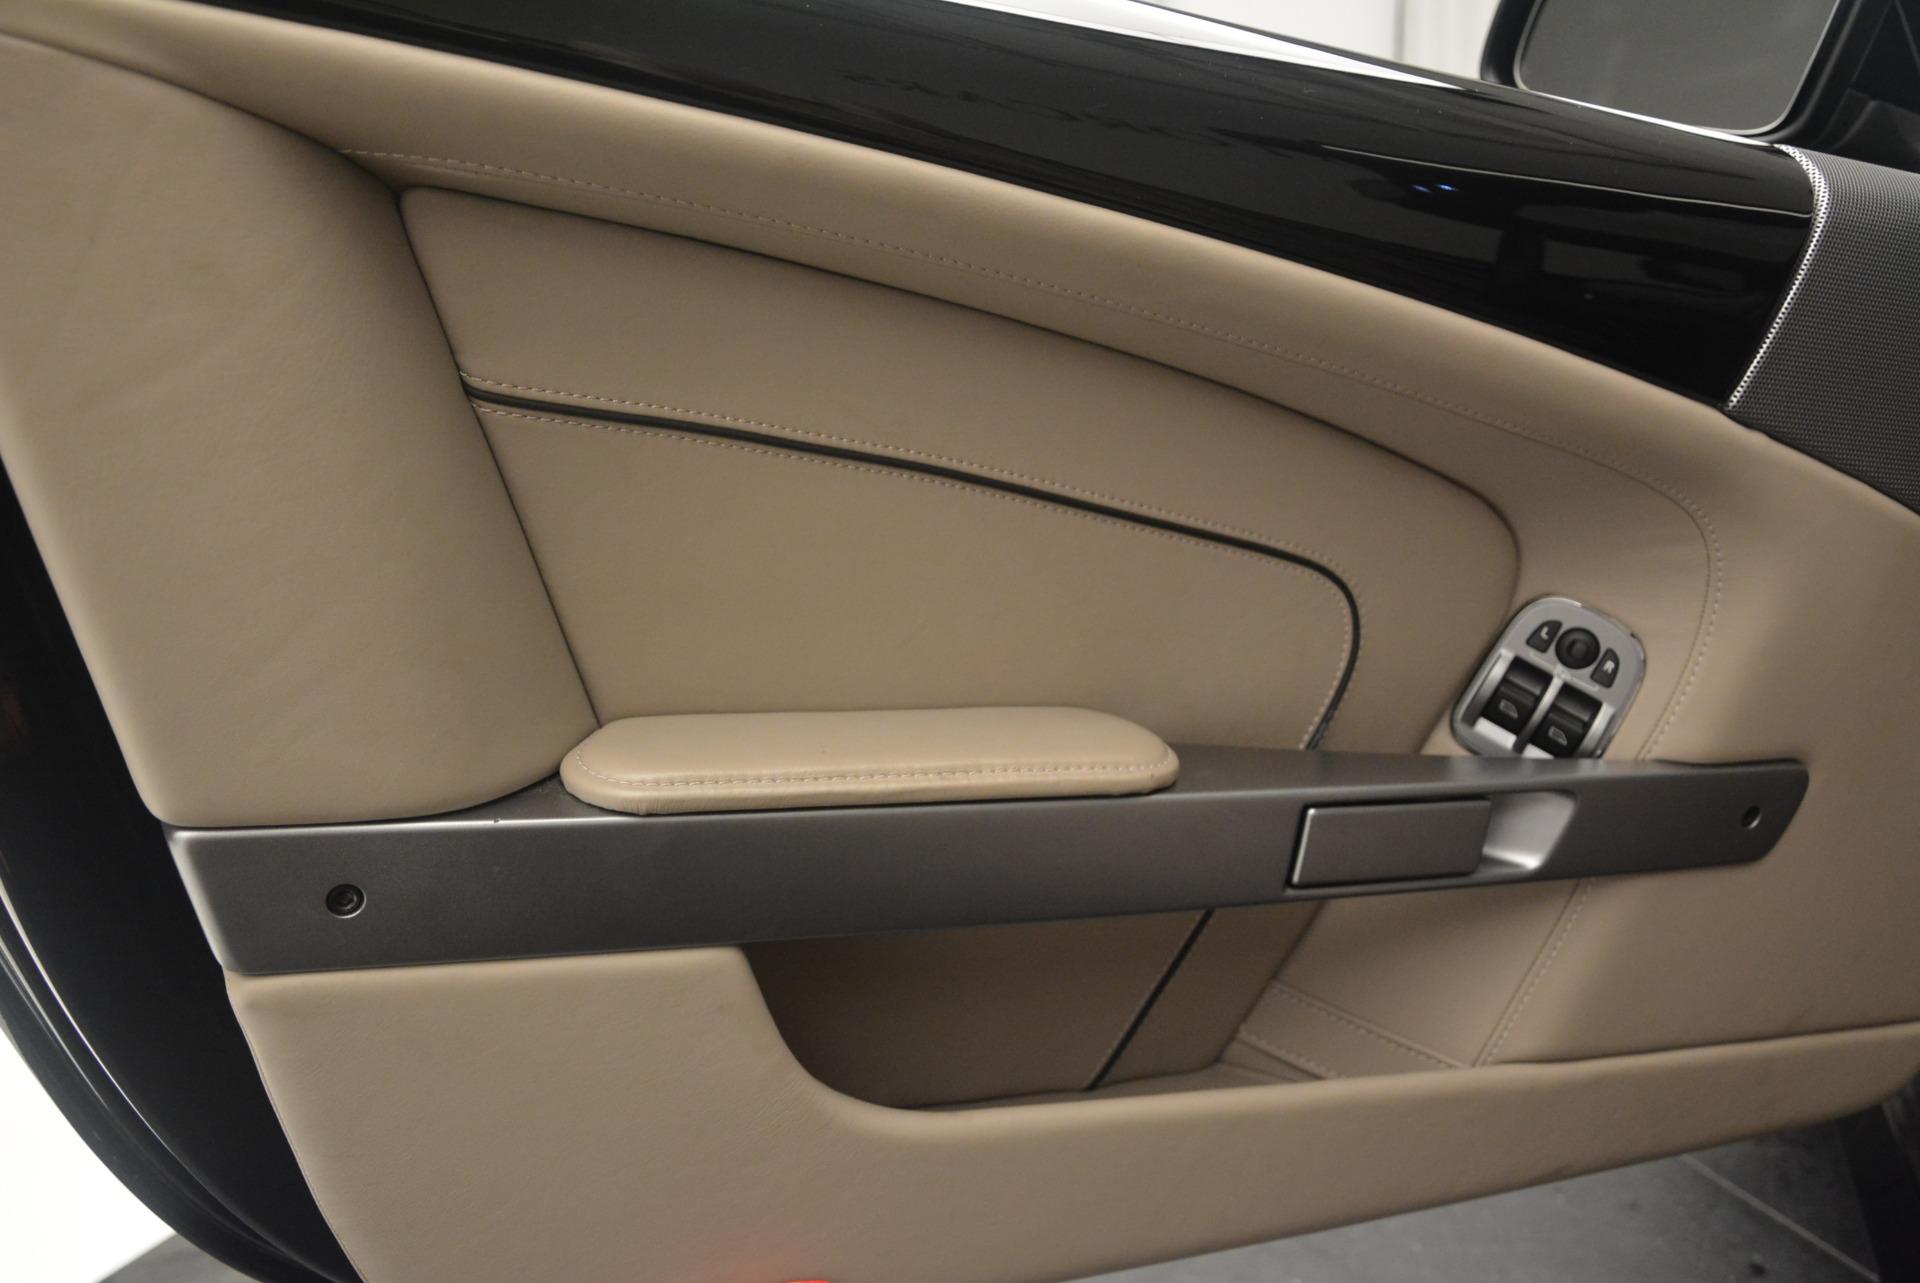 Used 2015 Aston Martin DB9 Volante For Sale In Westport, CT 2318_p23